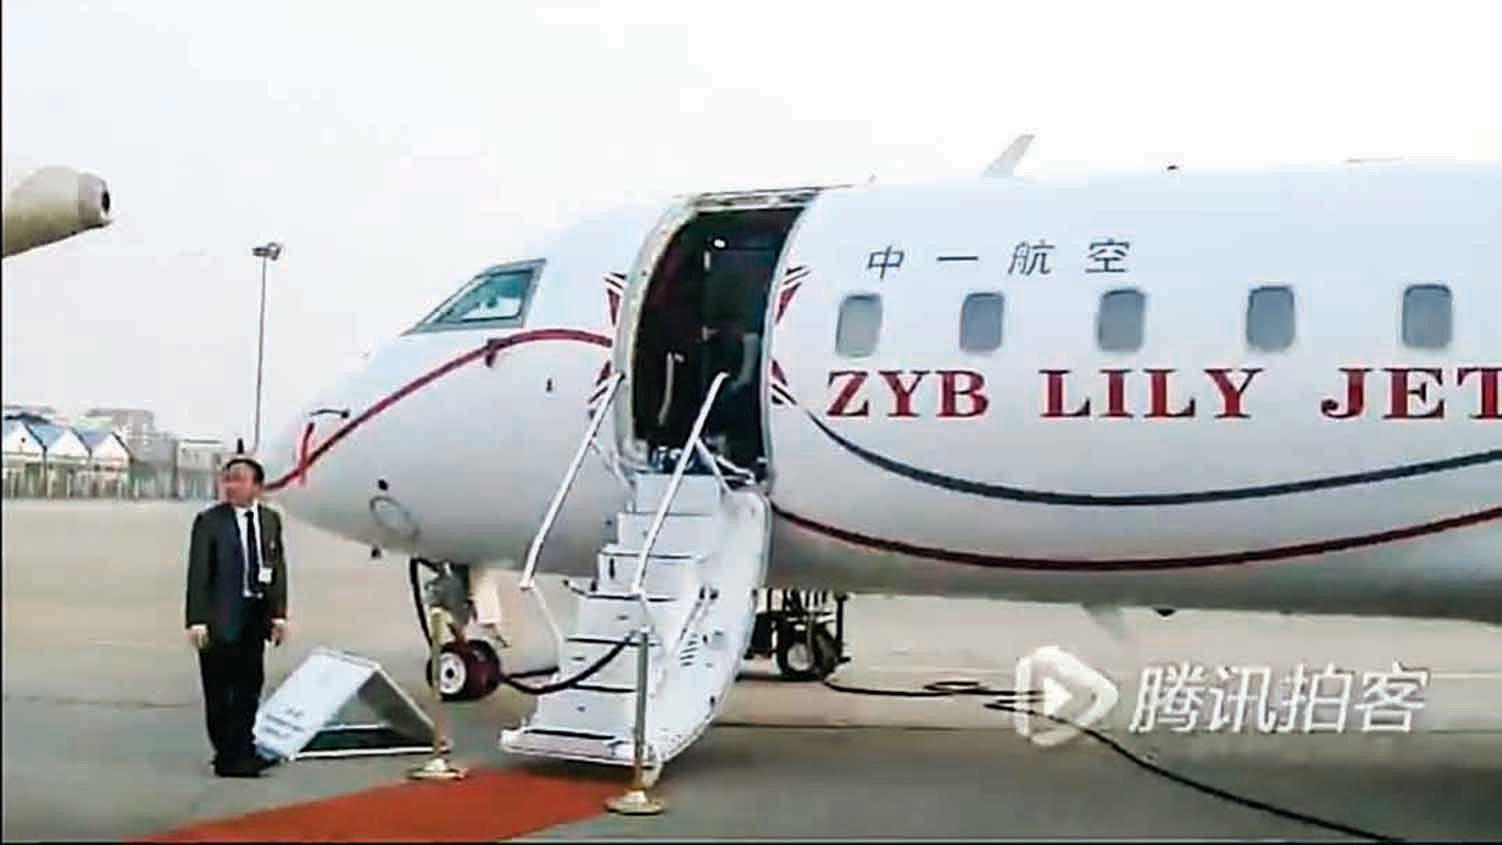 趙本山的私人飛機彭巴迪挑戰者850商務機(Bombardier Challenger 850)。(影片截圖)